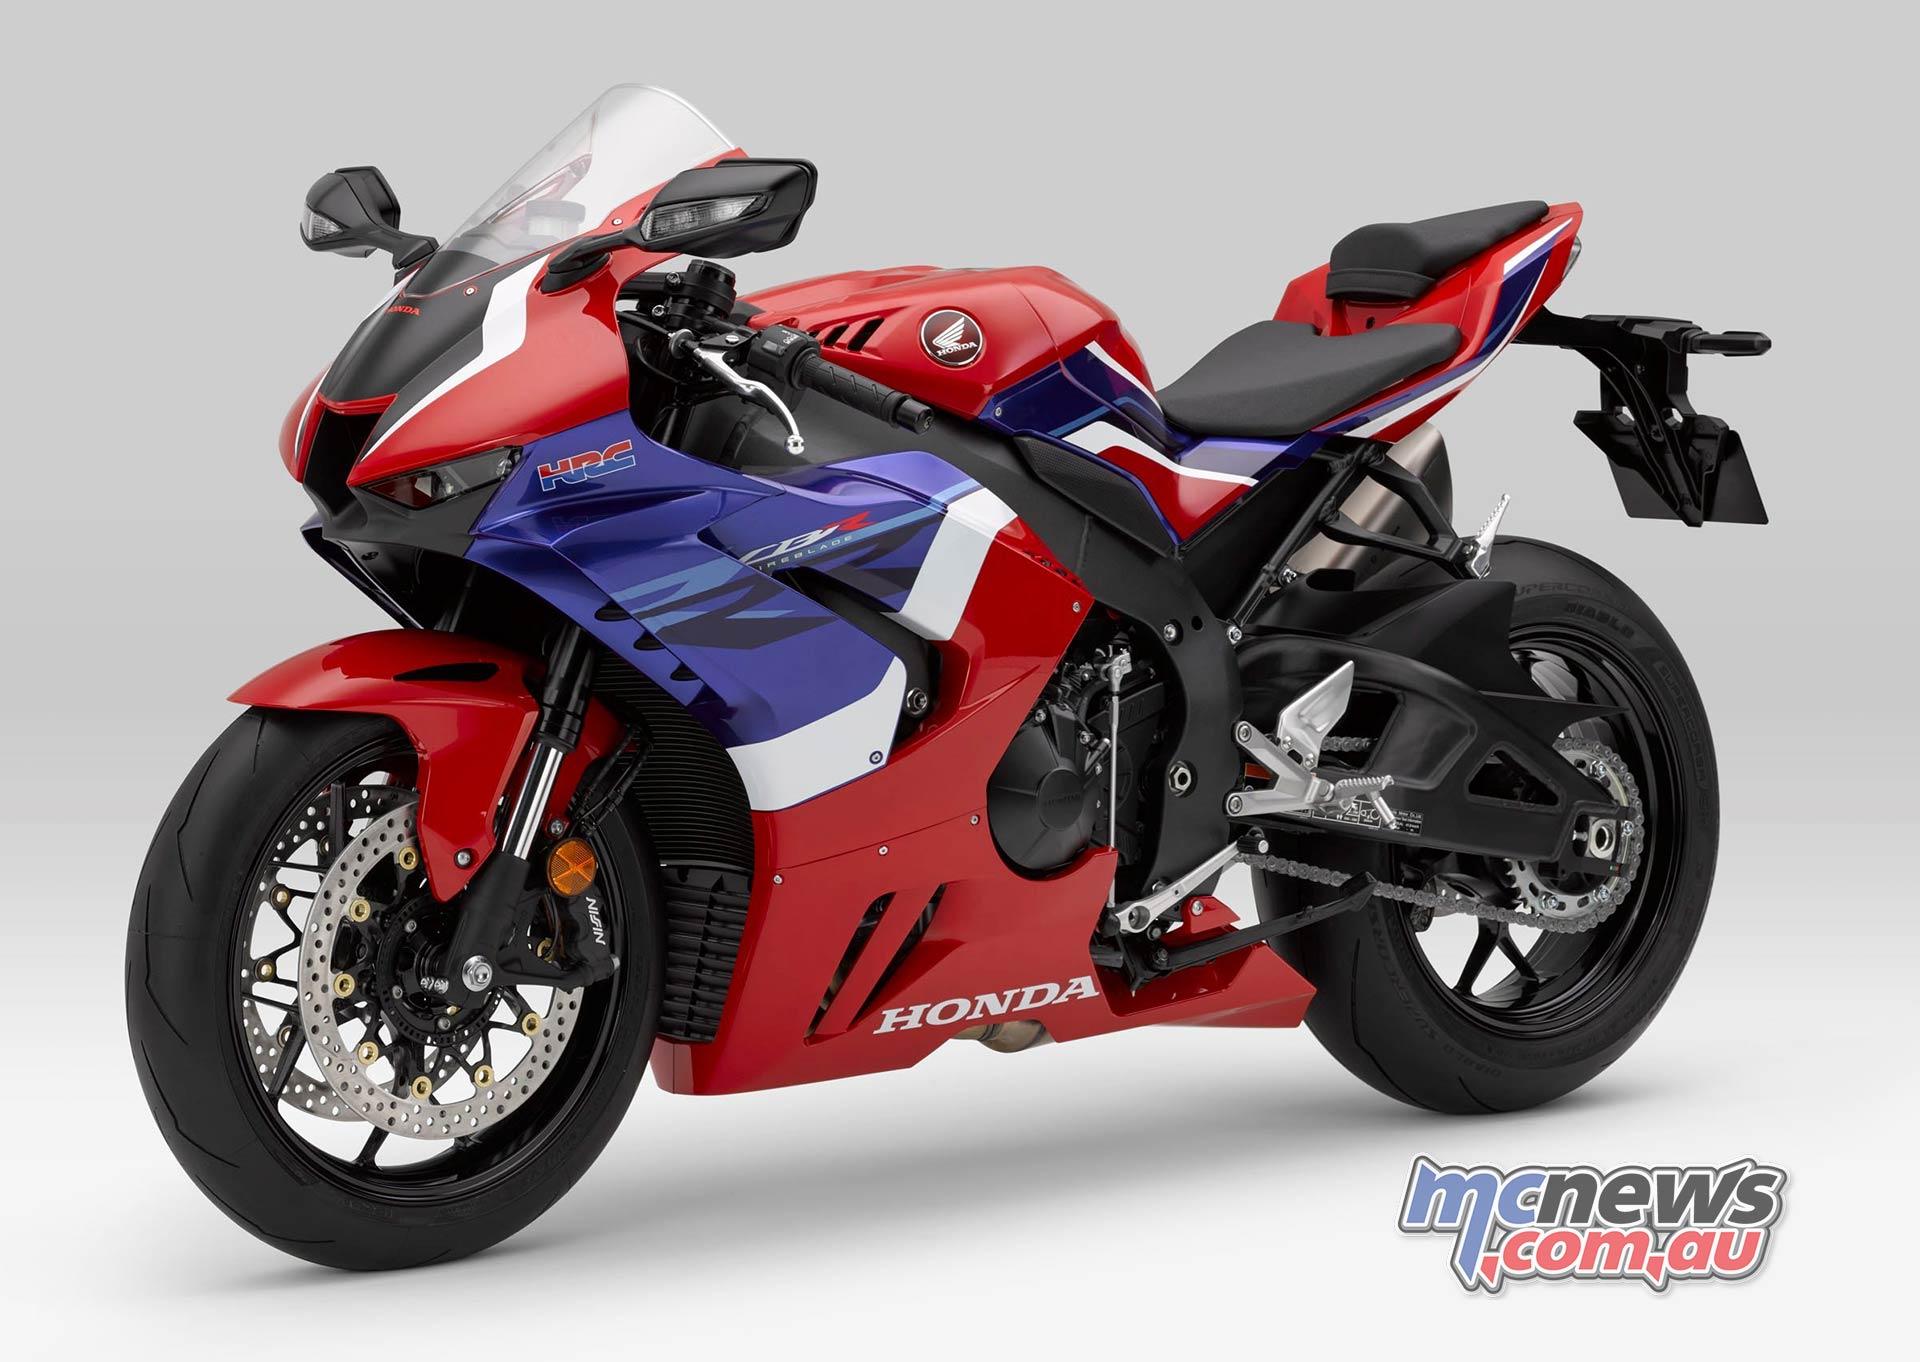 2020 Honda CBR1000RR Fireblade SP priced at 49999 ORC MCNews 1920x1362